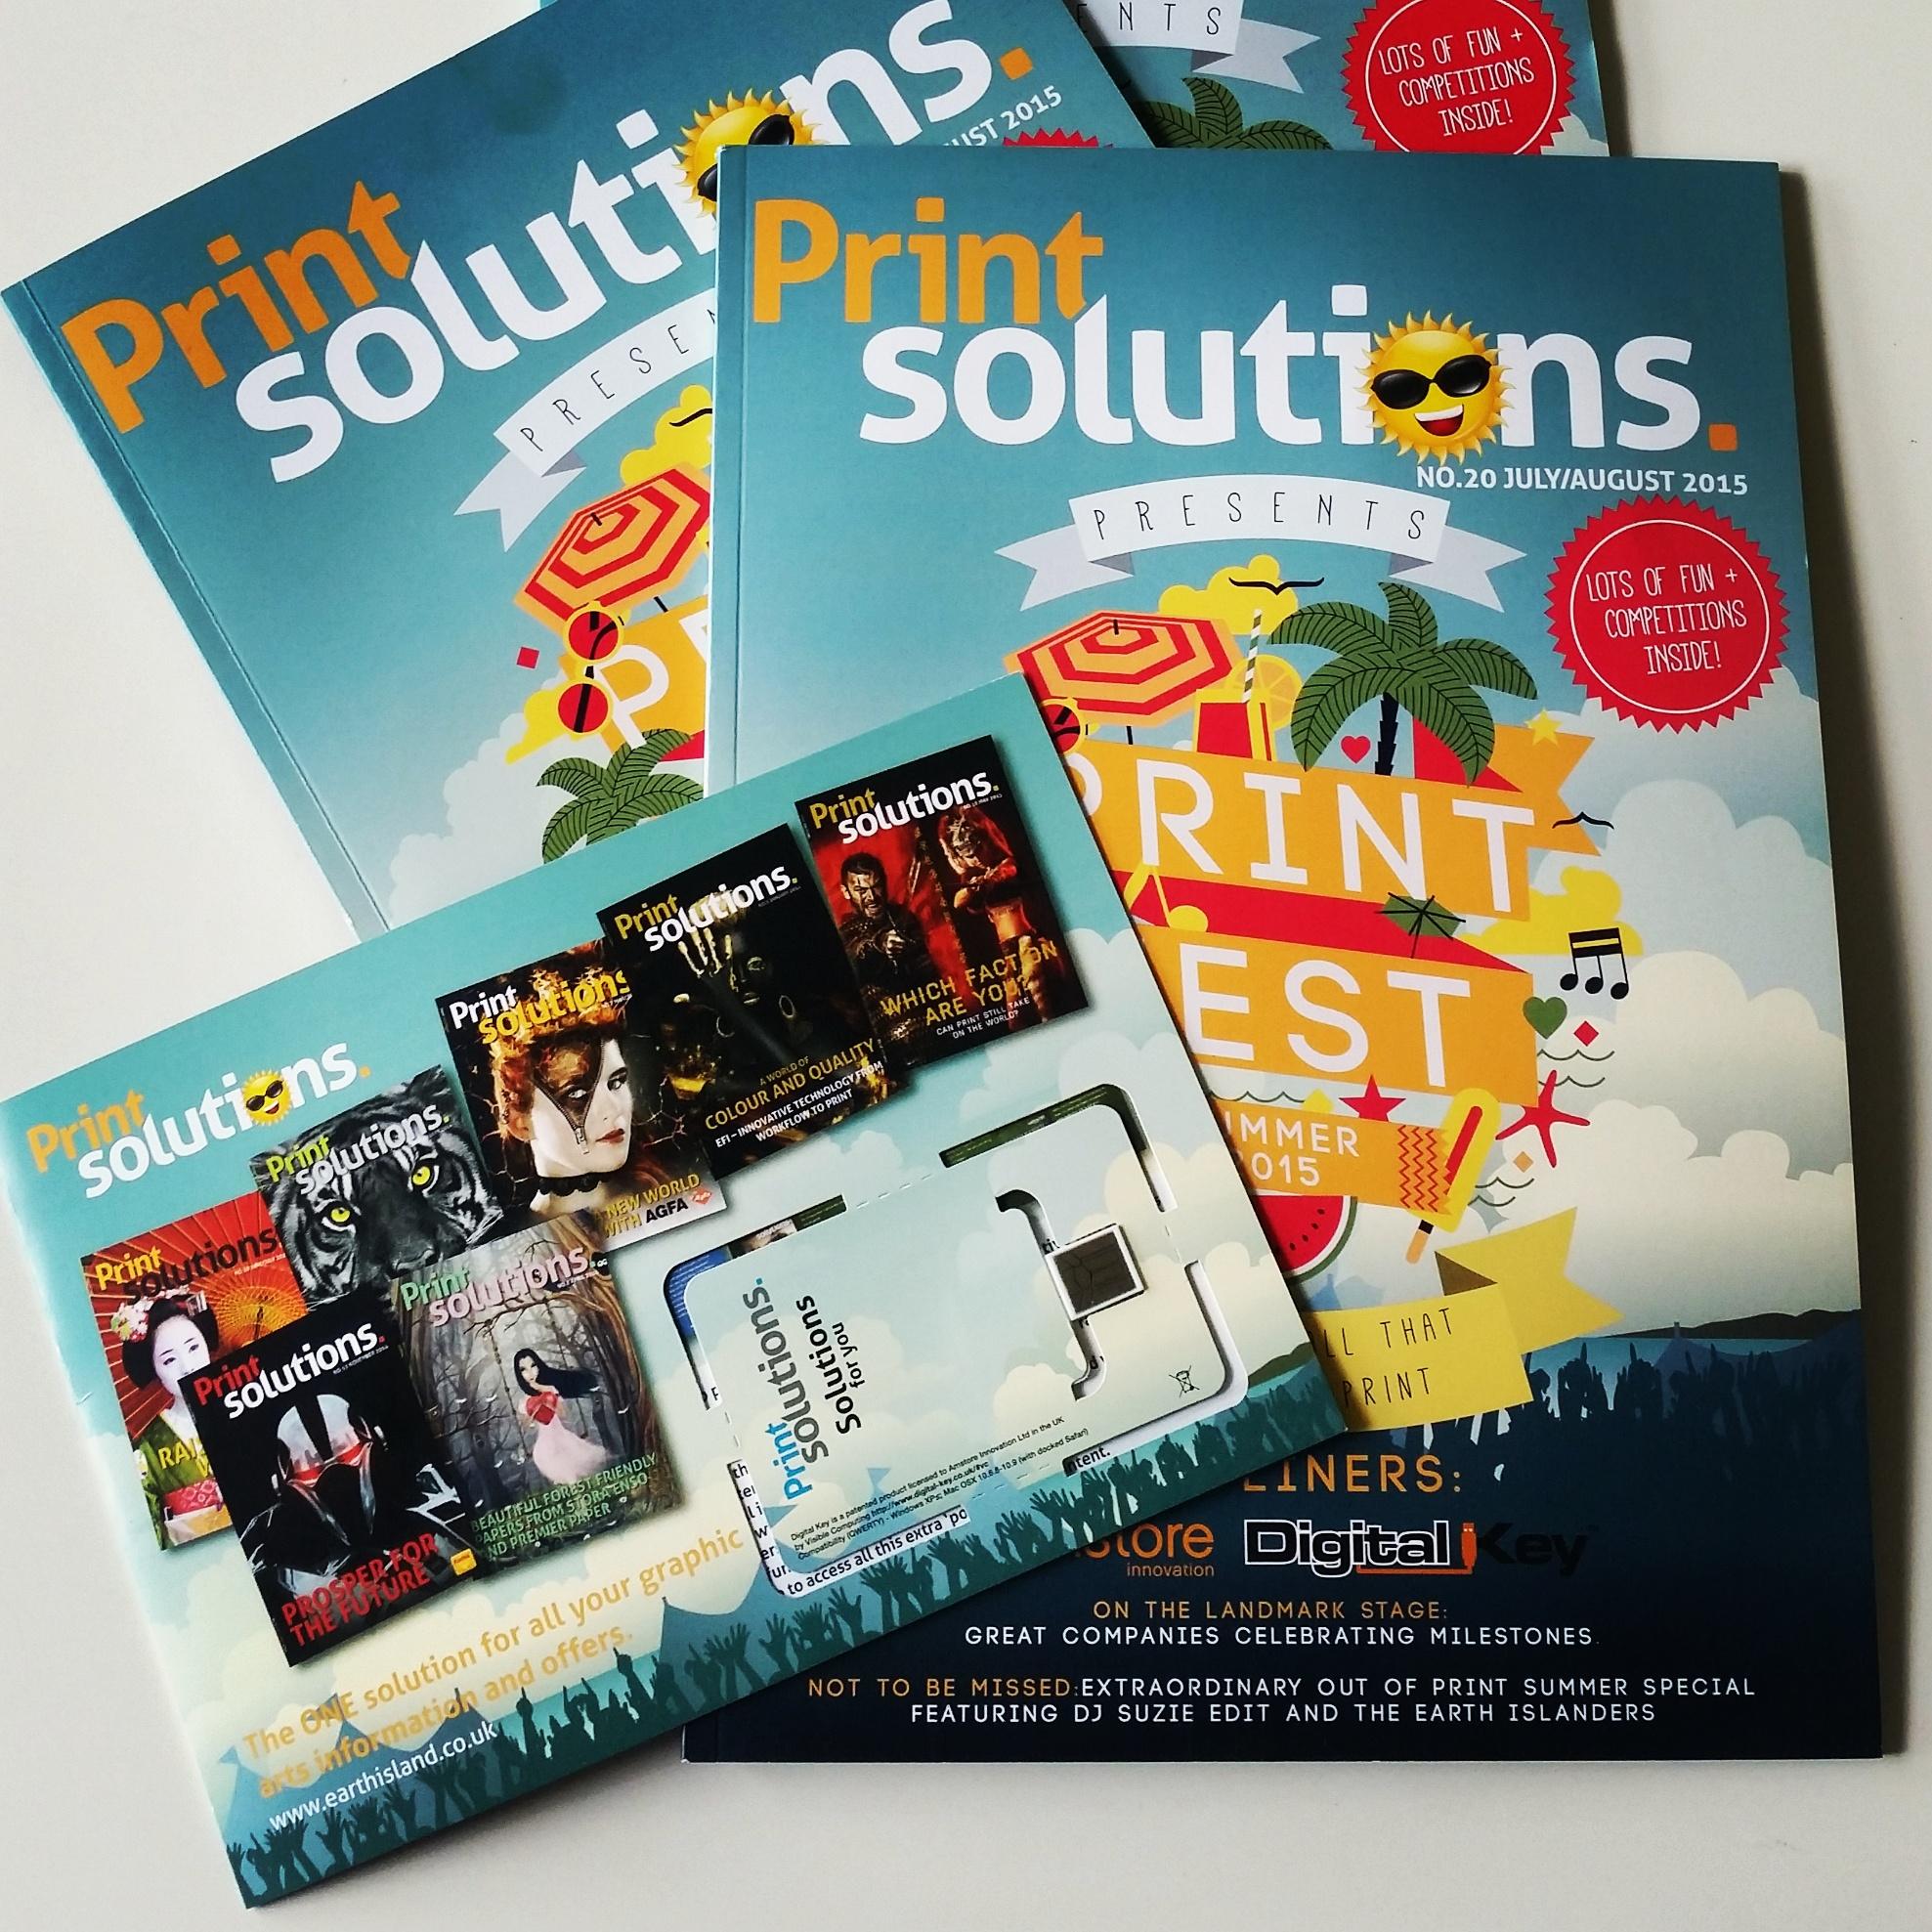 Print Solutions talks Digital Key - Print Solutions Talk Digital Key With Amstore Innovation